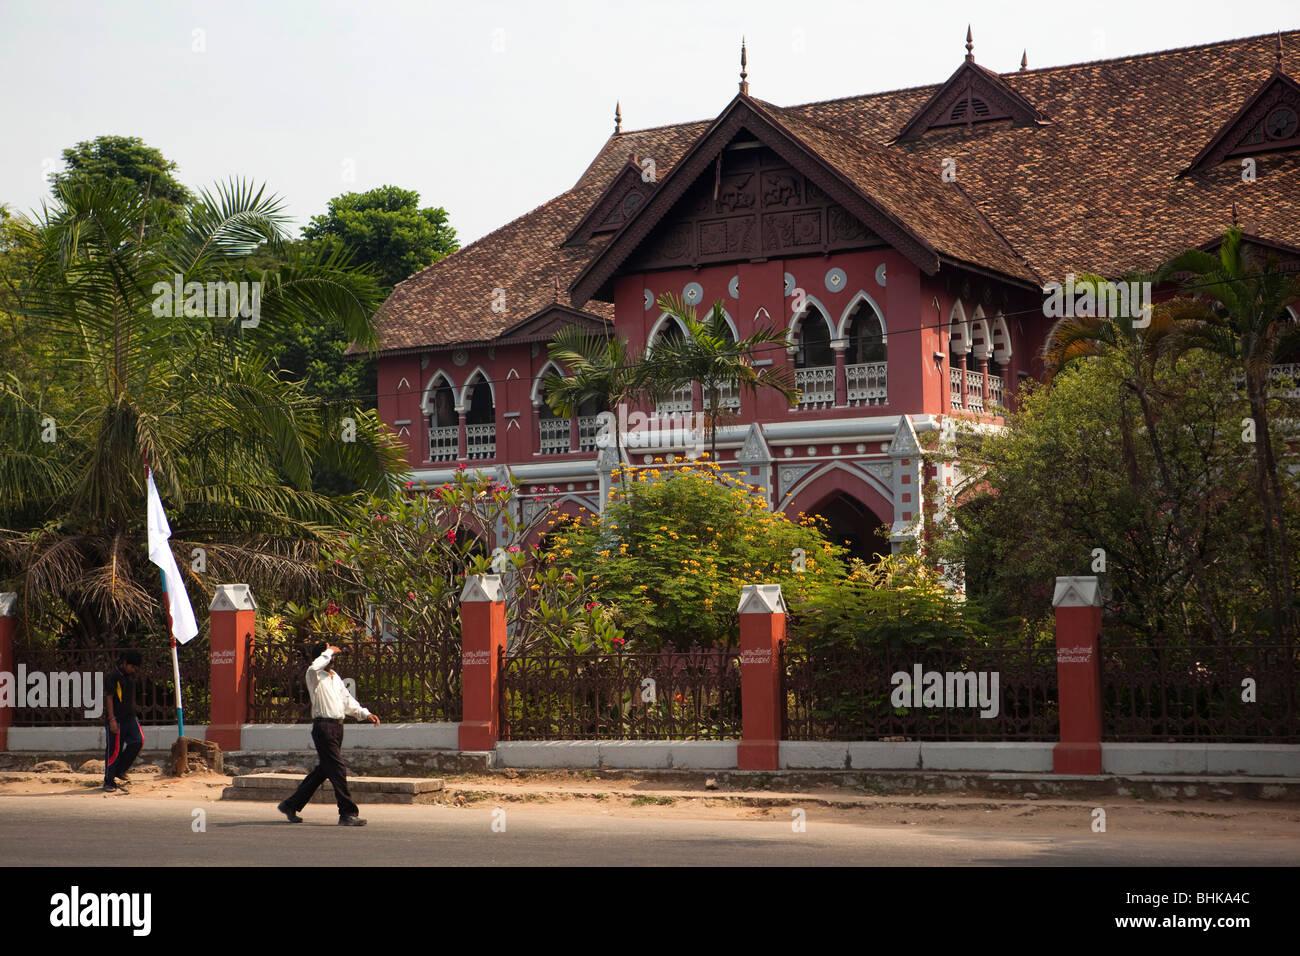 India Kerala, Thiruvananthapuram (Trivandrum), MG Road, College di Arti Decorative Immagini Stock